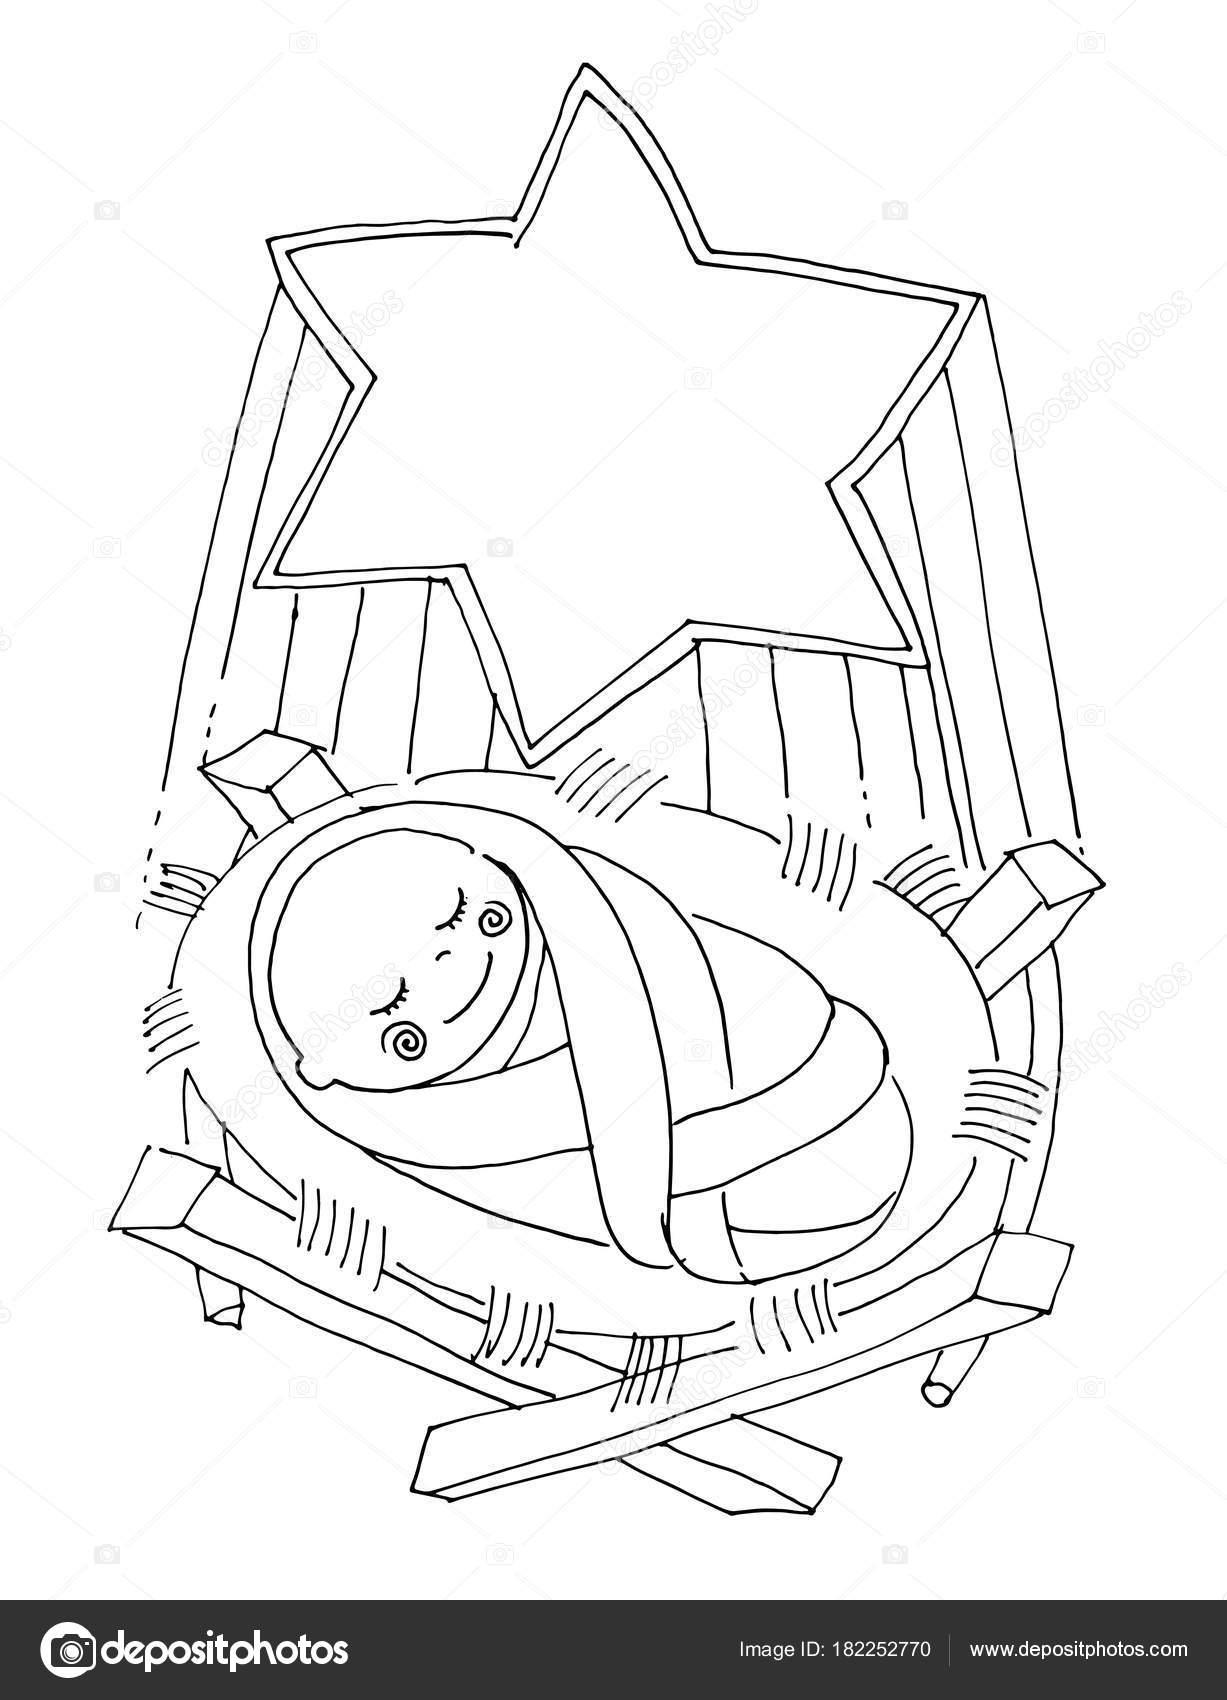 Vector Illustartion For Coloring Book Little Baby Jesus Lies In Stock Vector C Katbuslaeva 182252770